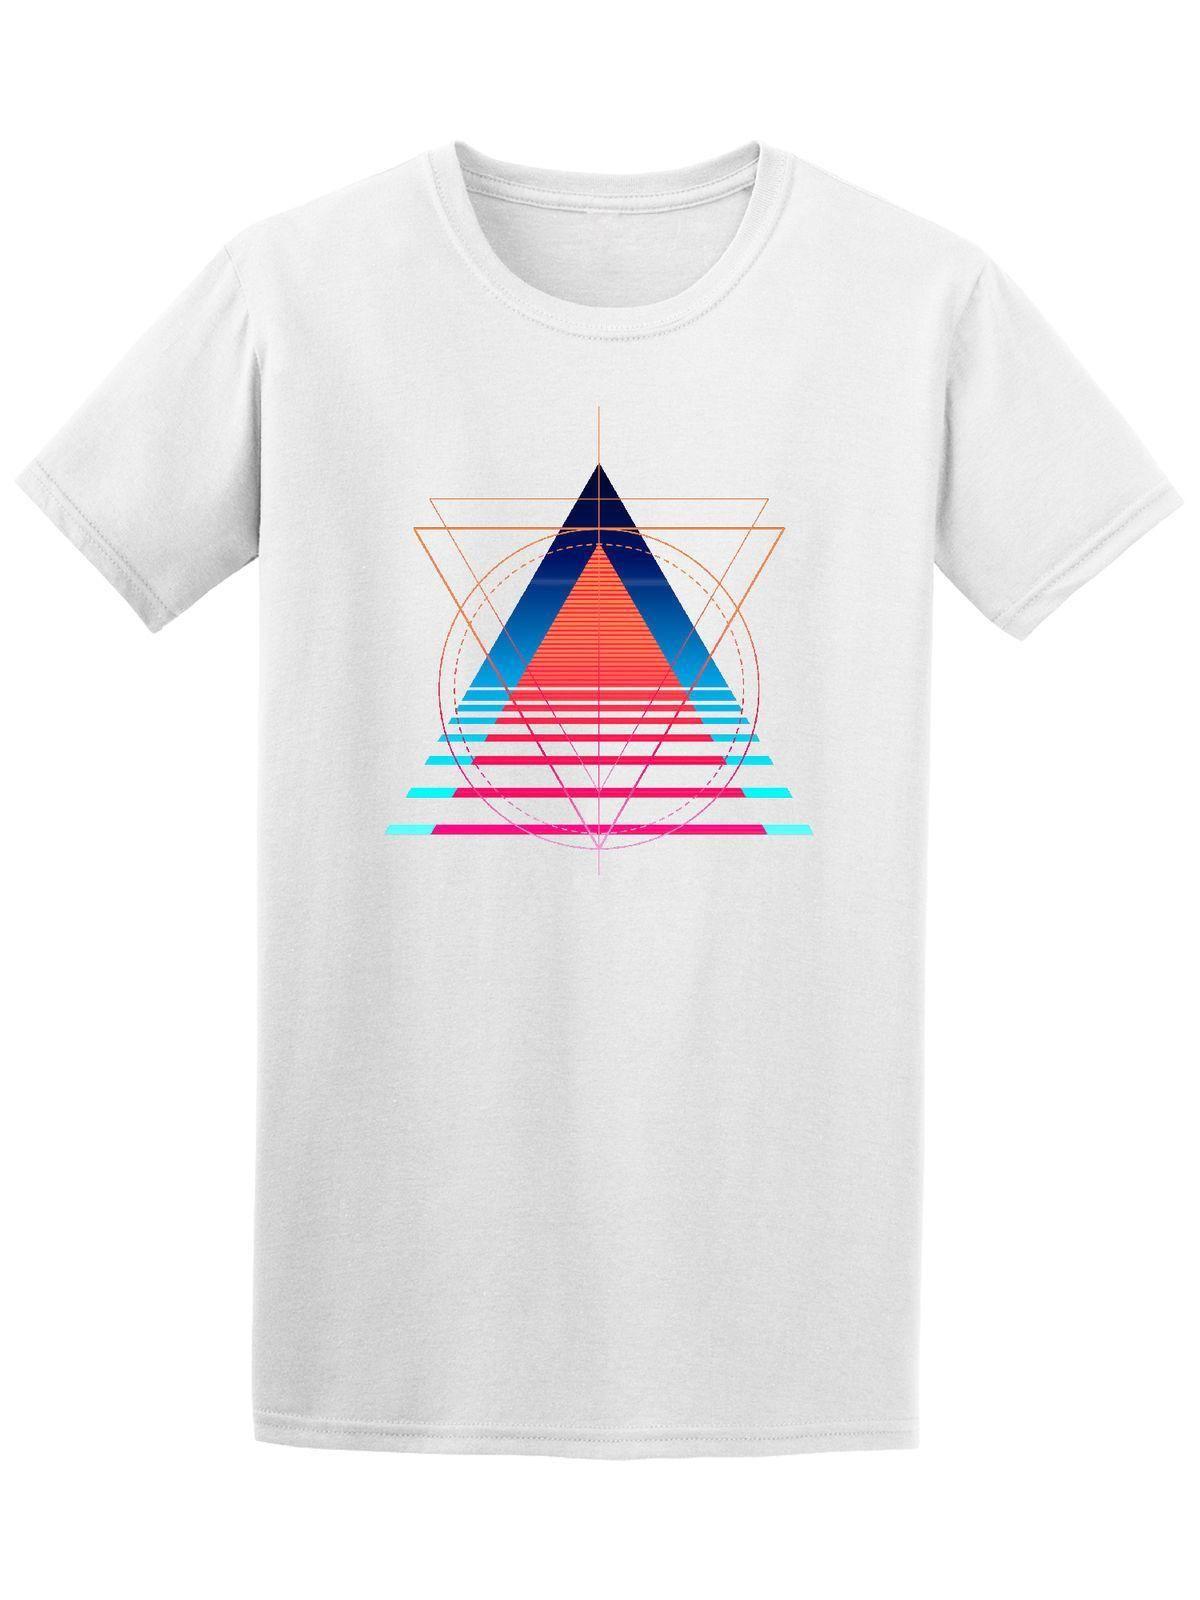 4e5dd0a4e374 Retro Geometric Abstract Triangles Tee Hipster Tees Summer Mens T Shirt  Short Sleeve T-Shirt Free Shipping